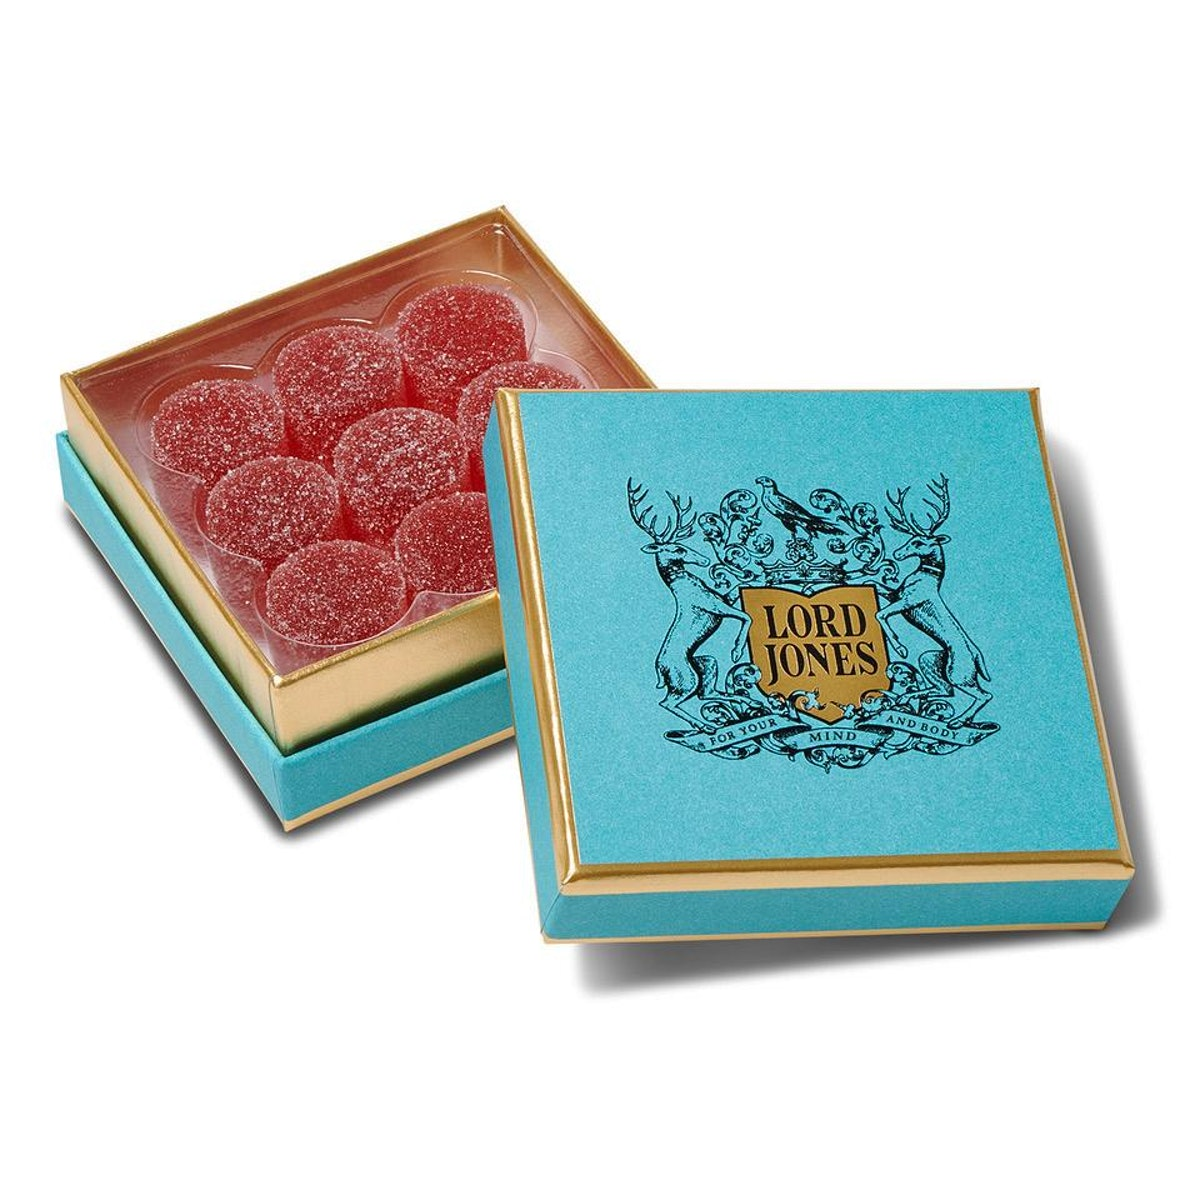 Limited Edition Red Raspberry Summer CBD Gumdrops